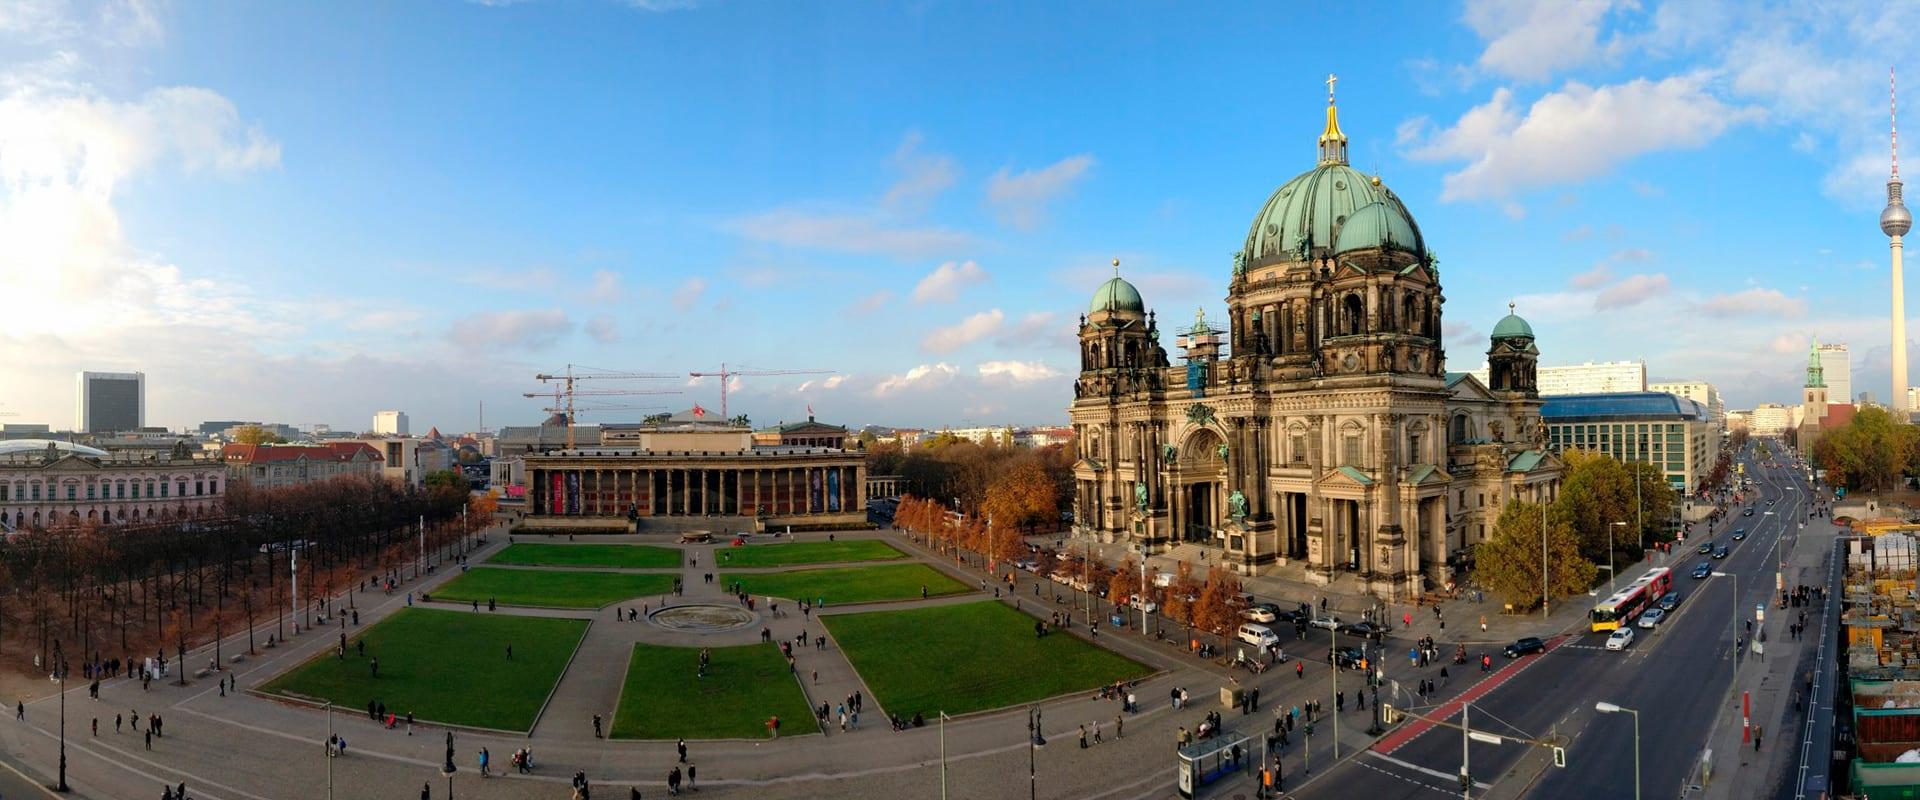 Museumsinsel – A famosa Ilha dos Museus de Berlim